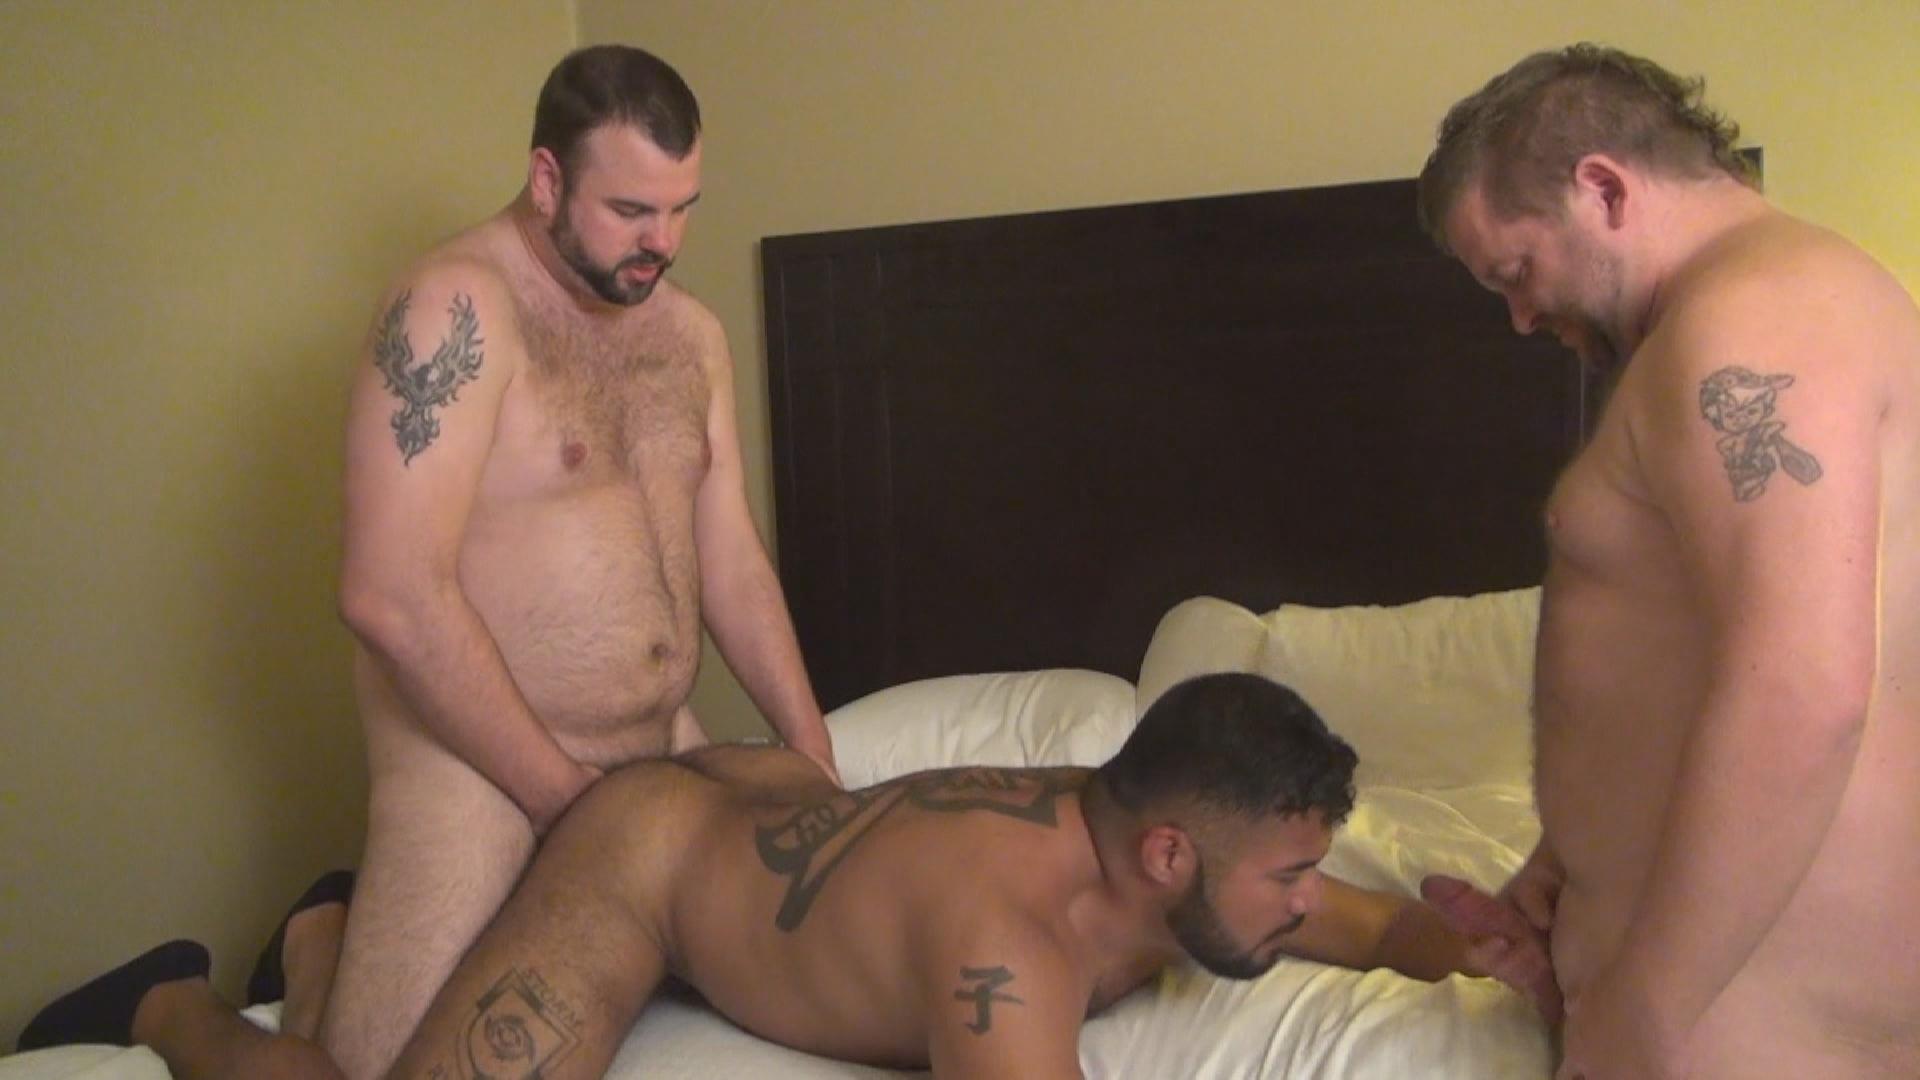 Hot Raw Bears Xvideo gay